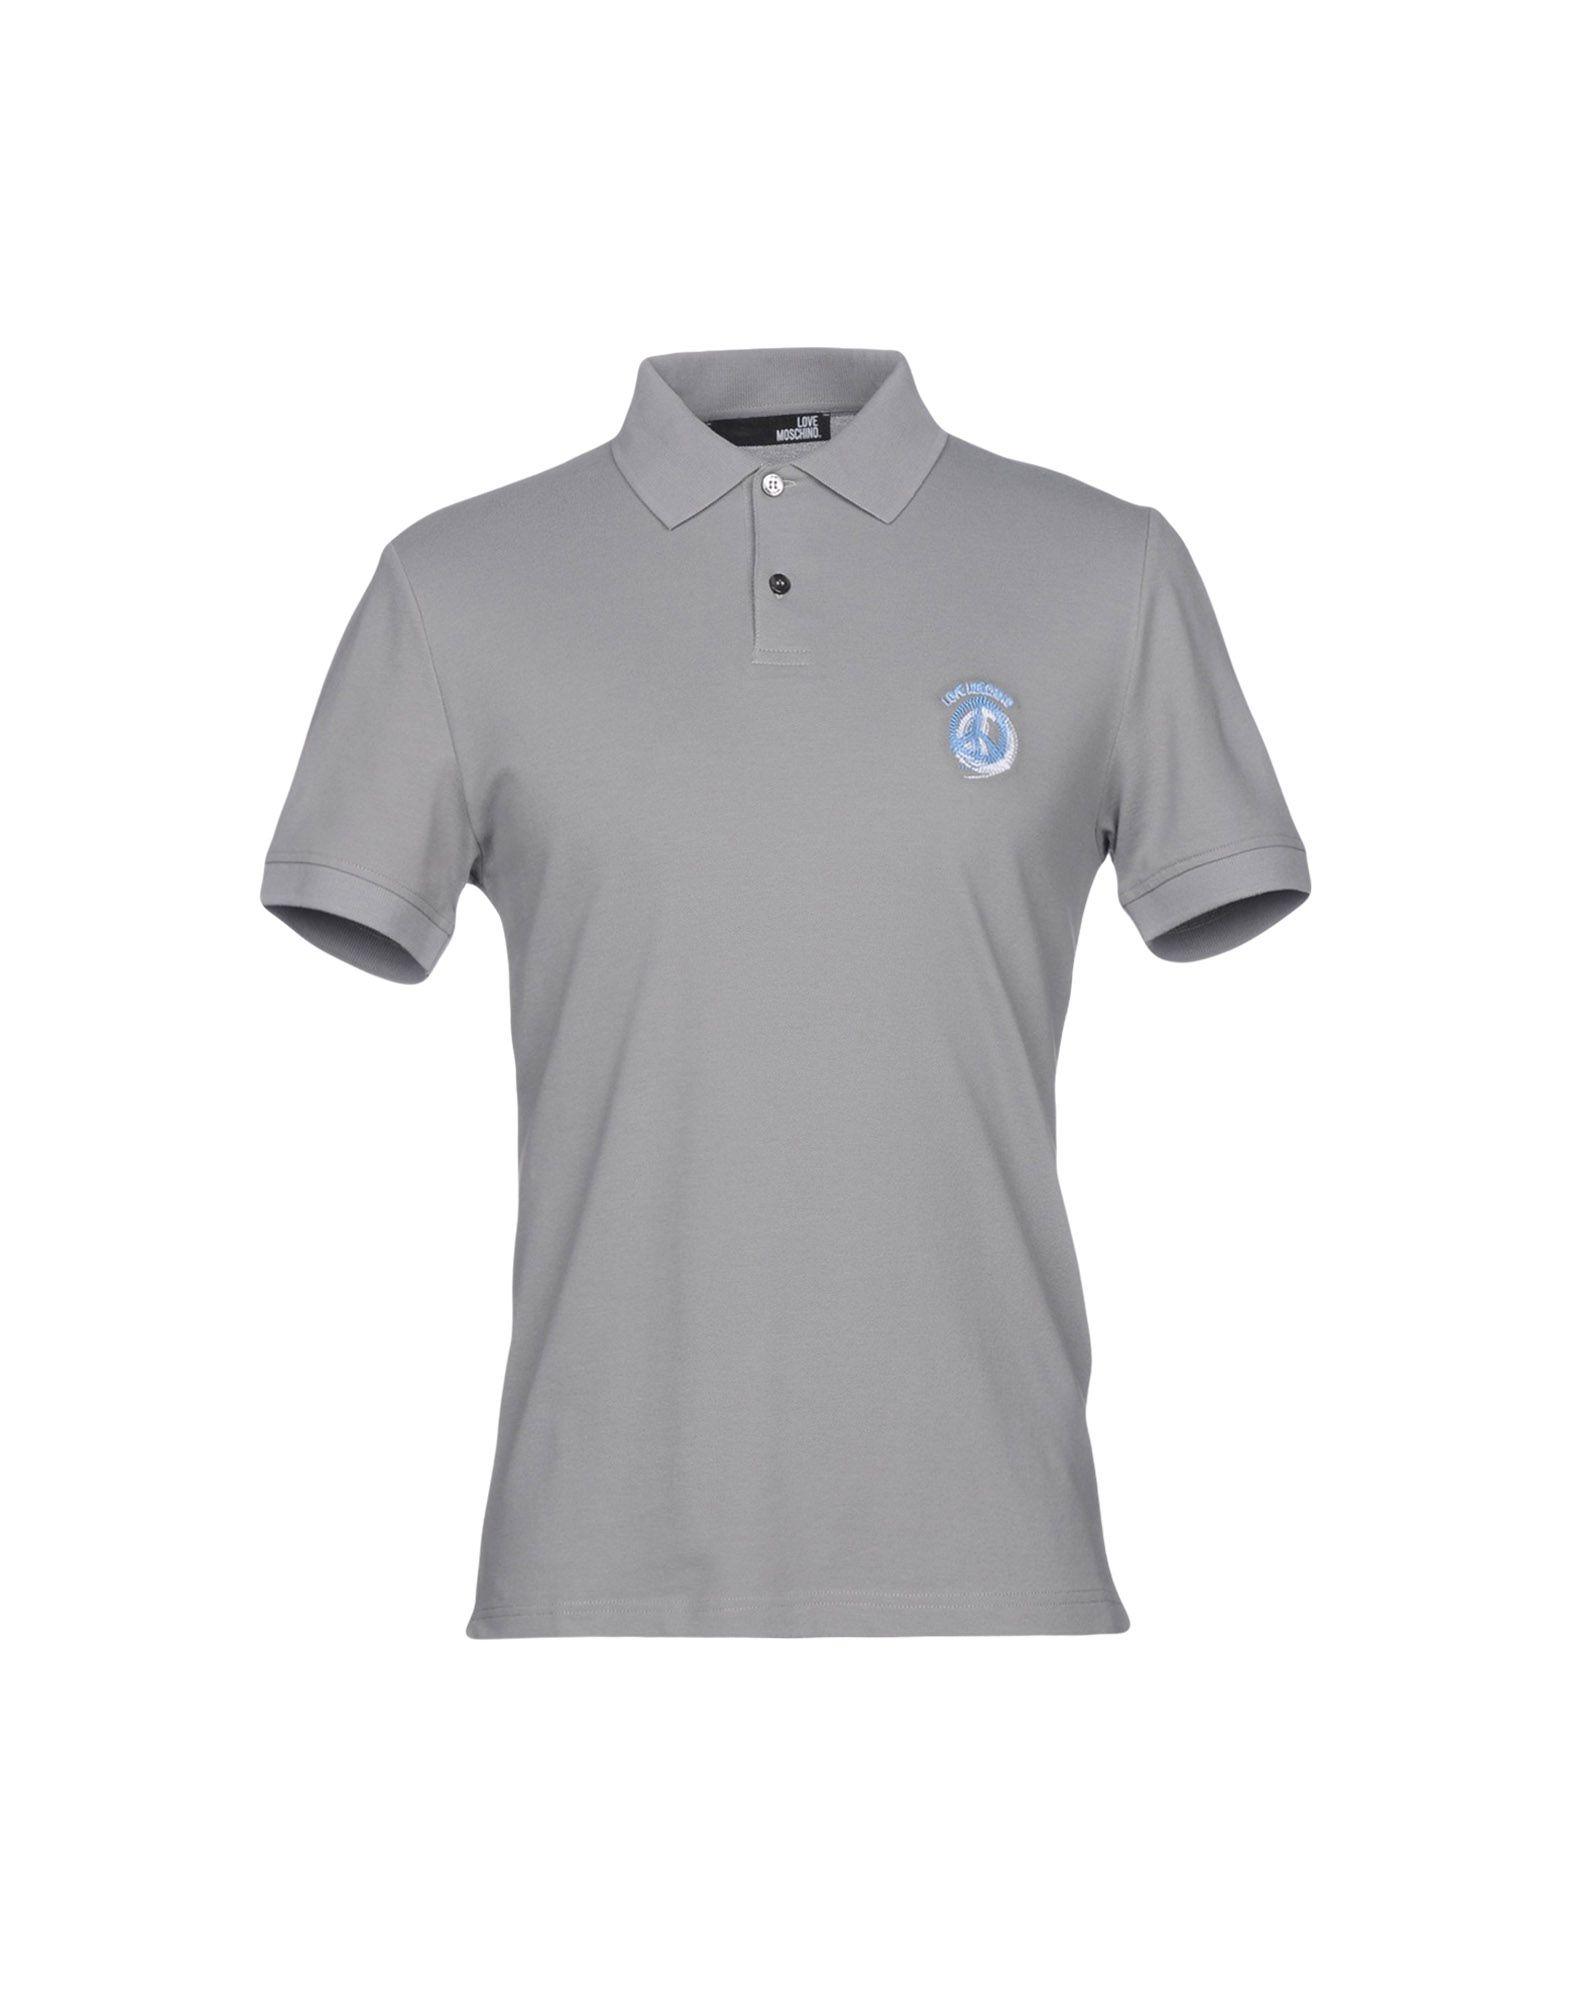 8255919ba Love Moschino Polo Shirt - Men Love Moschino Polo Shirts online on ...